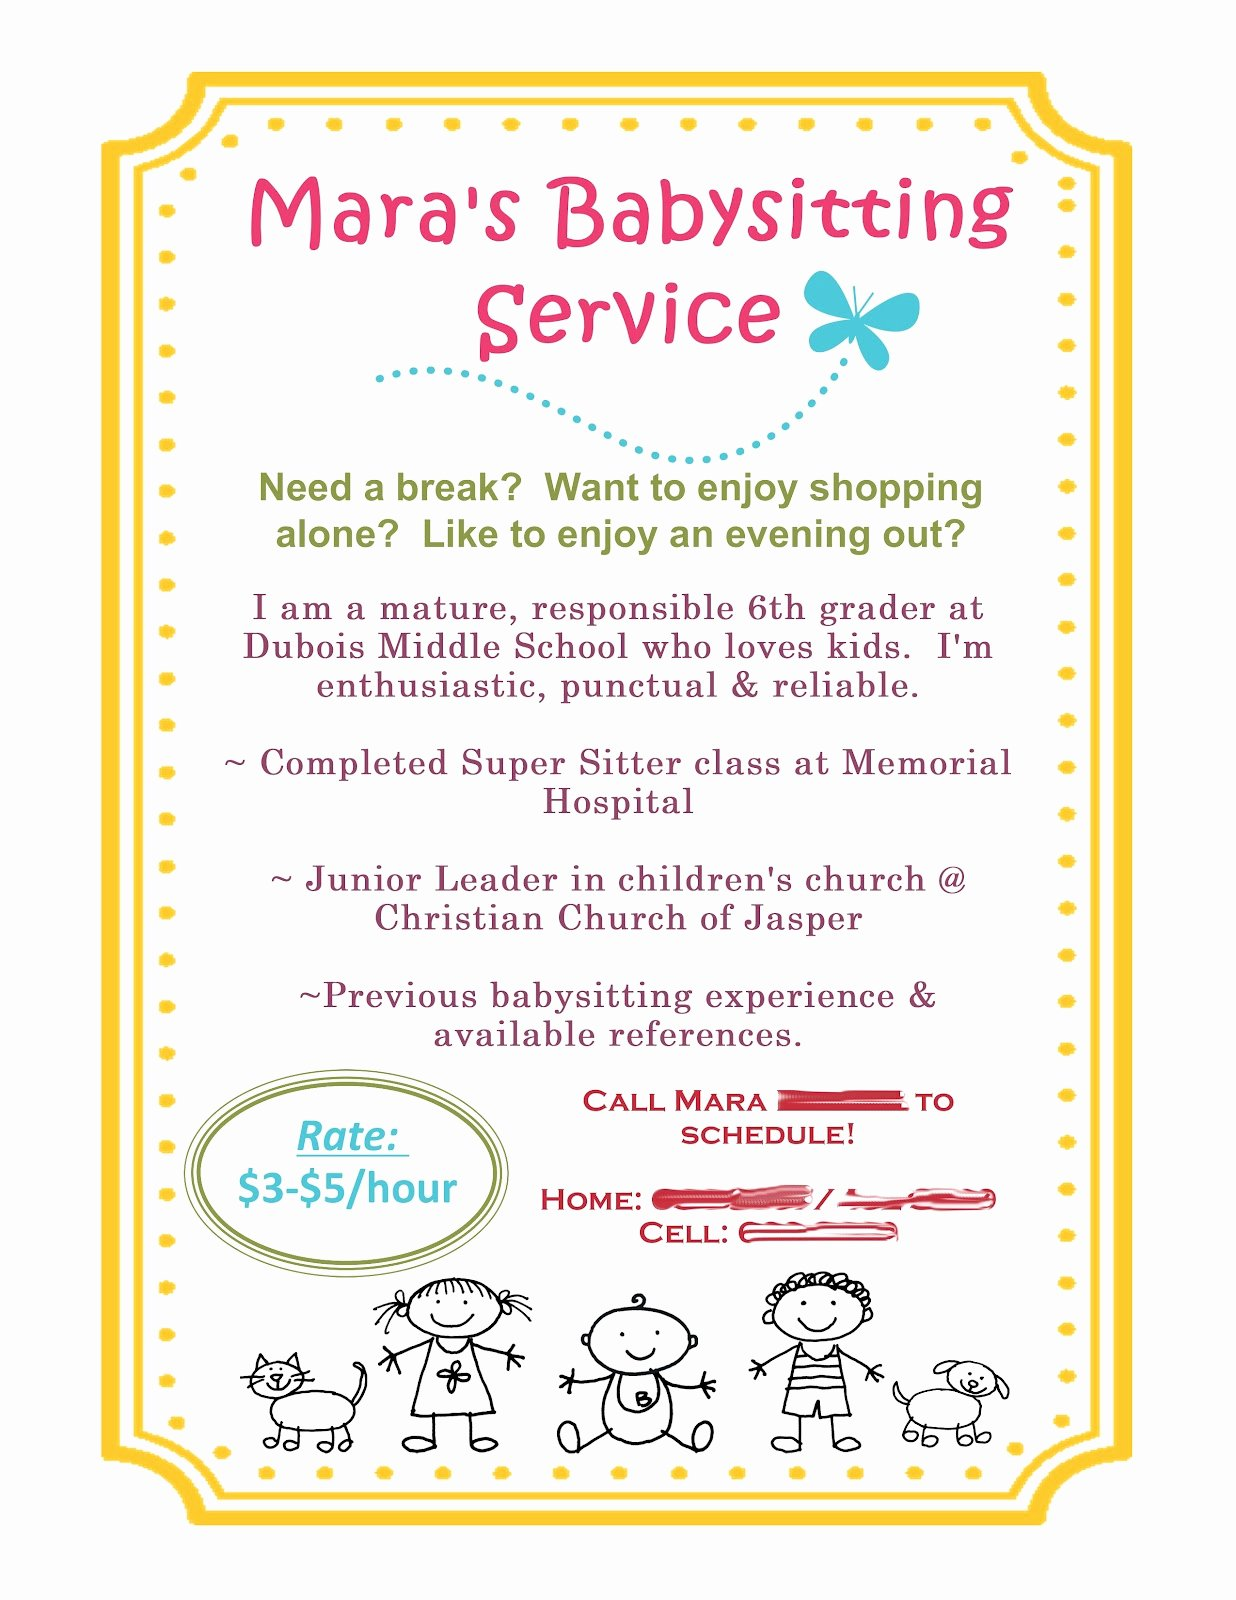 Free Babysitting Flyer Template Luxury Scrap Happy Babysitting Flyer Using Mds